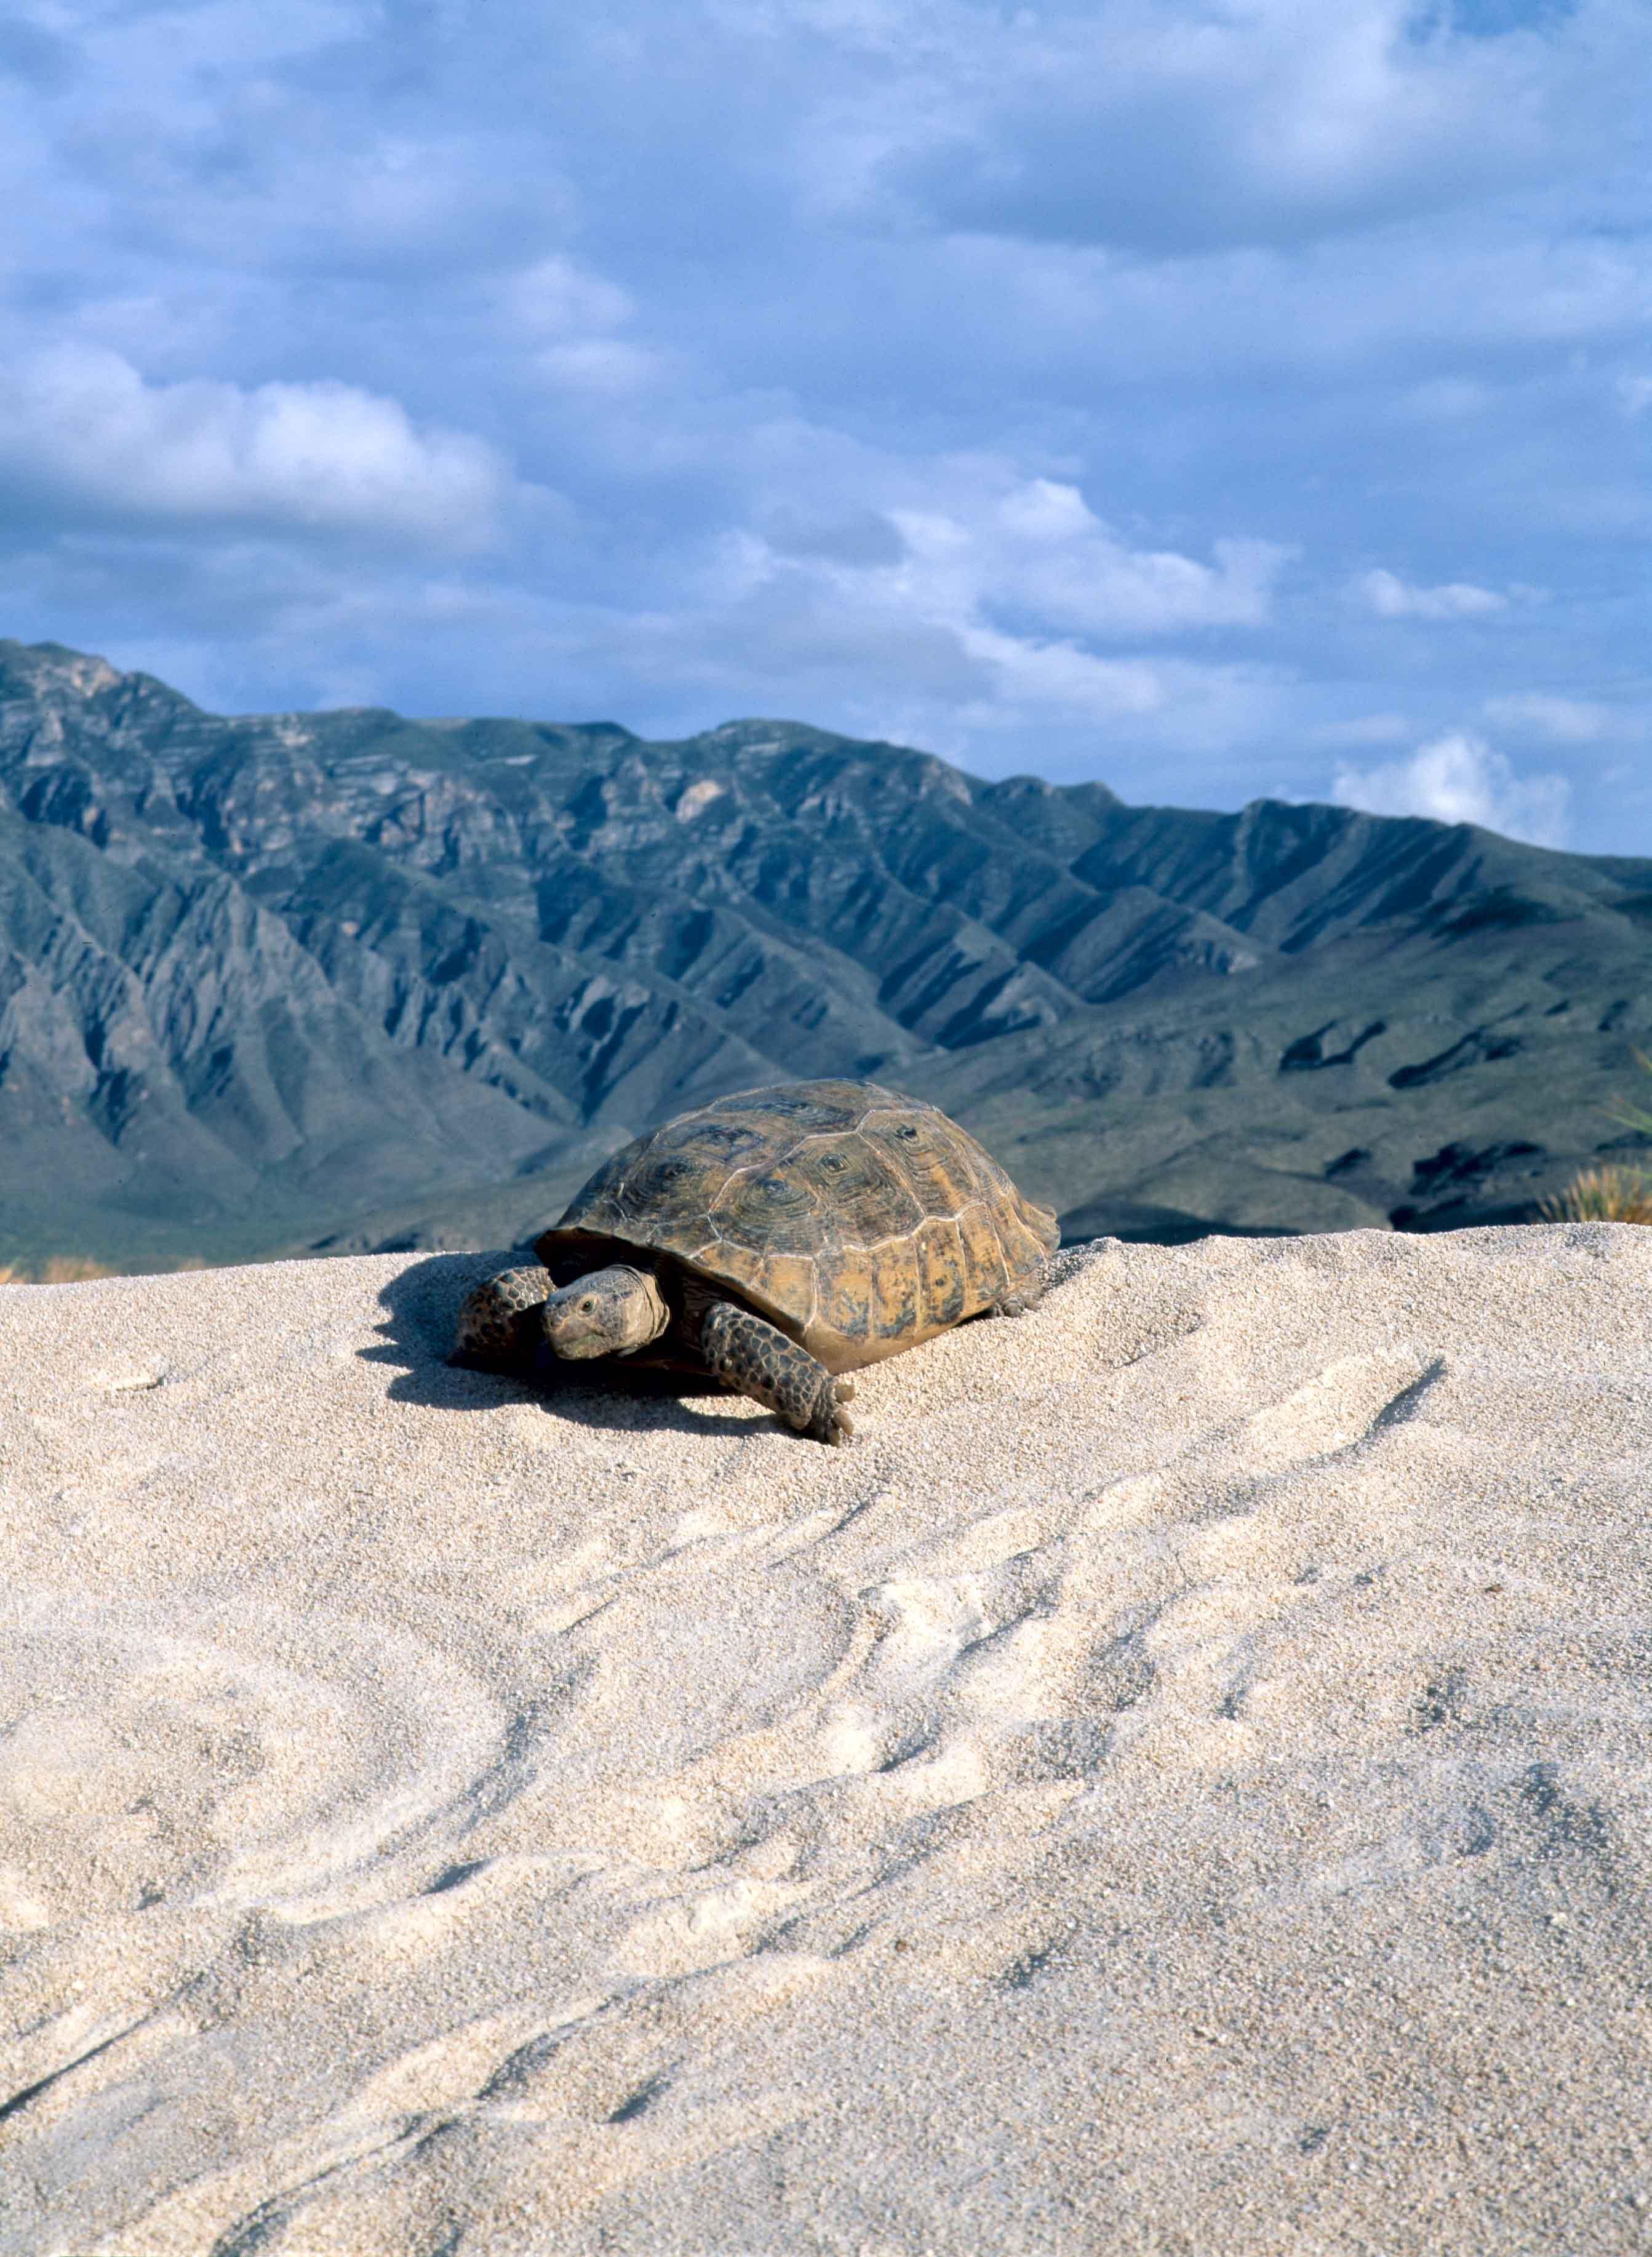 File:Dunas de Yeso, Cuatrociénegas, Coahuila (22757888709).jpg - Wikimedia Commons